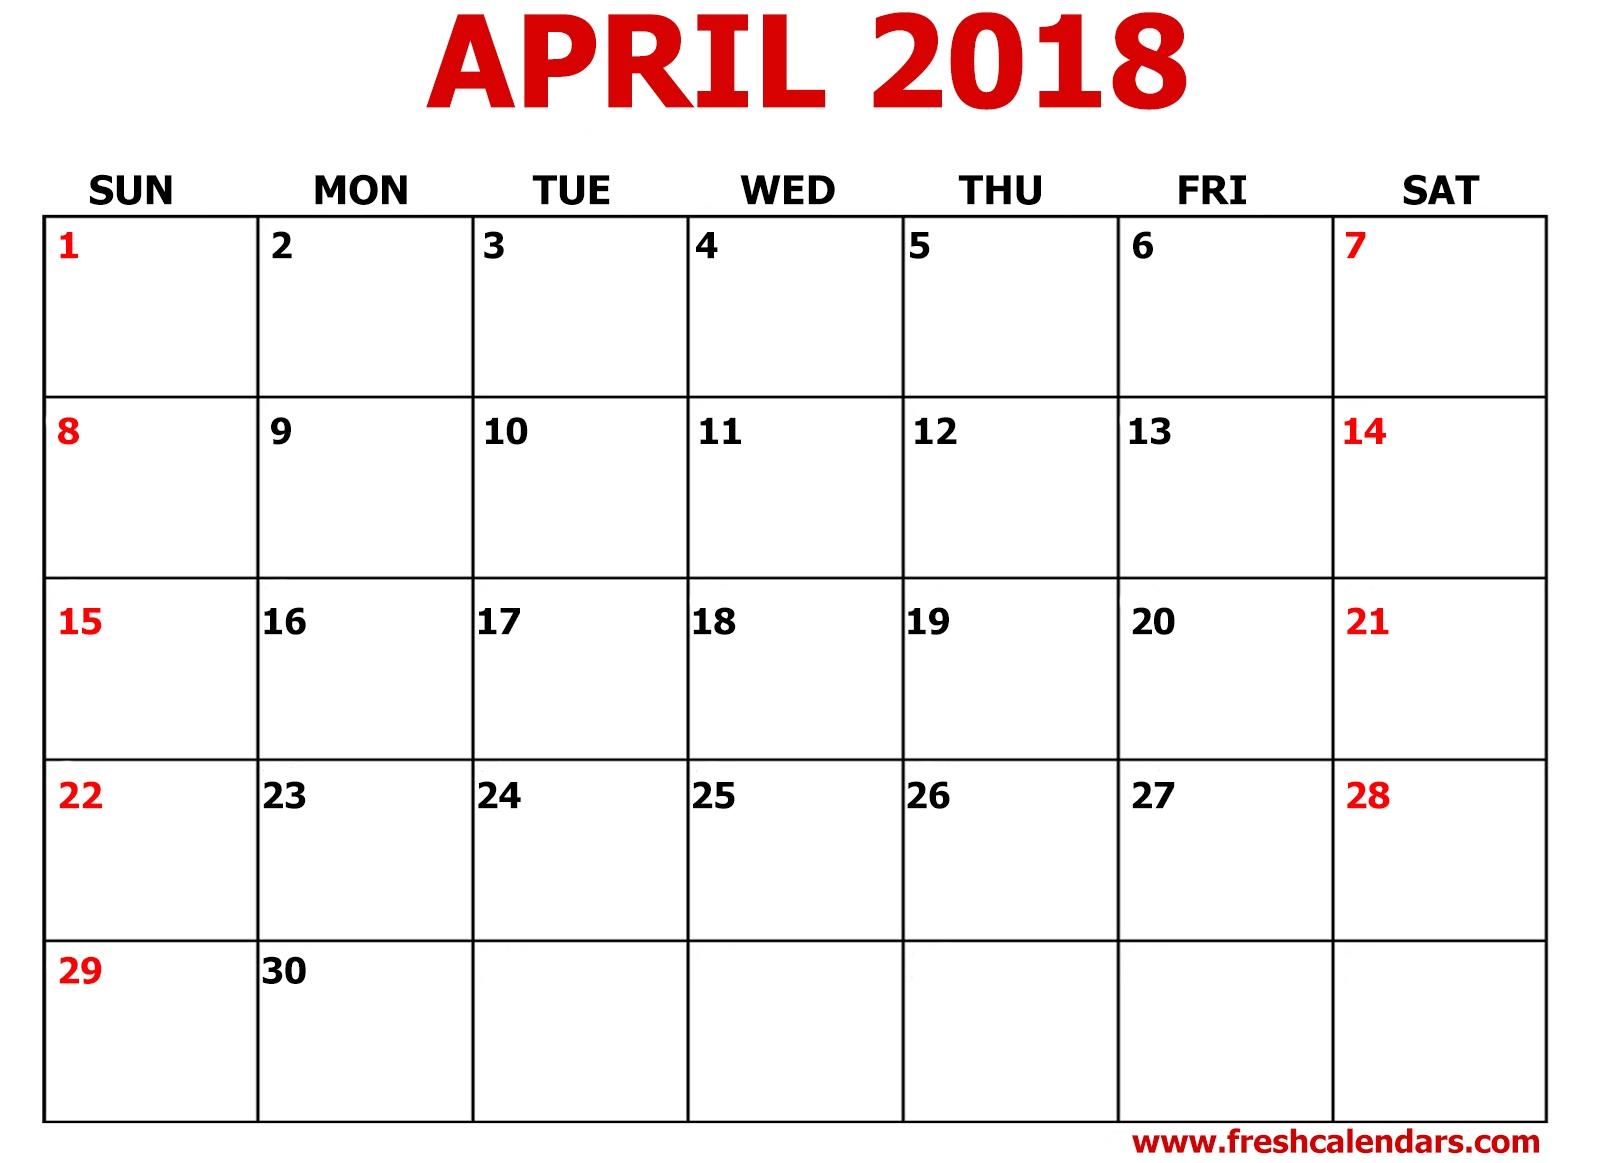 April 2018 Printable Calendar Templates  Xjb